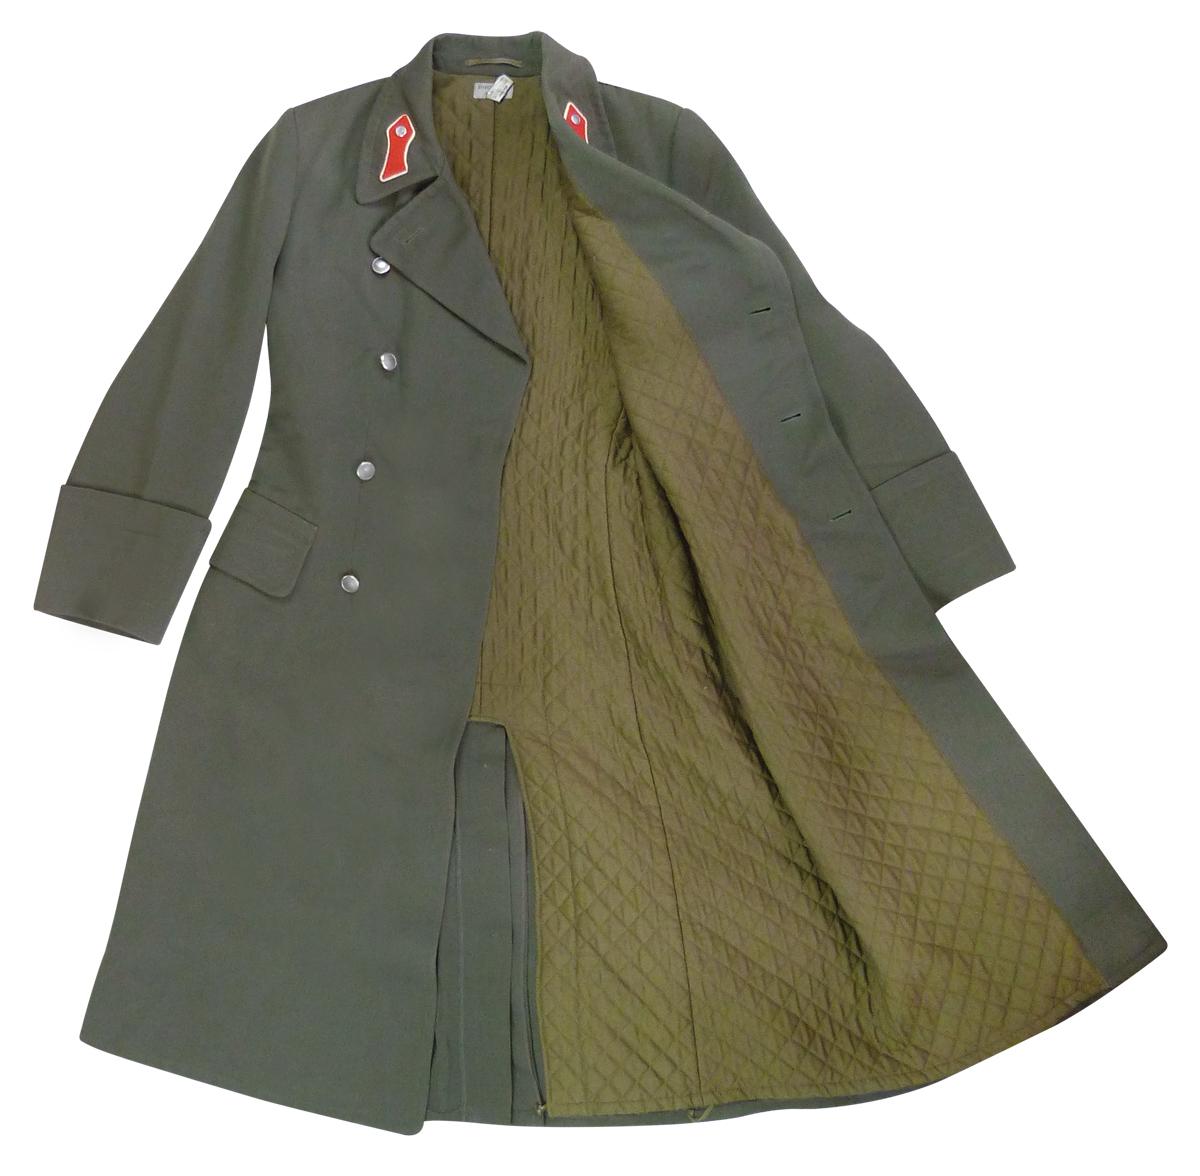 Austrian Great Coat · Austrian Great Coat · Austrian Great Coat ... e67bf0ff9f4